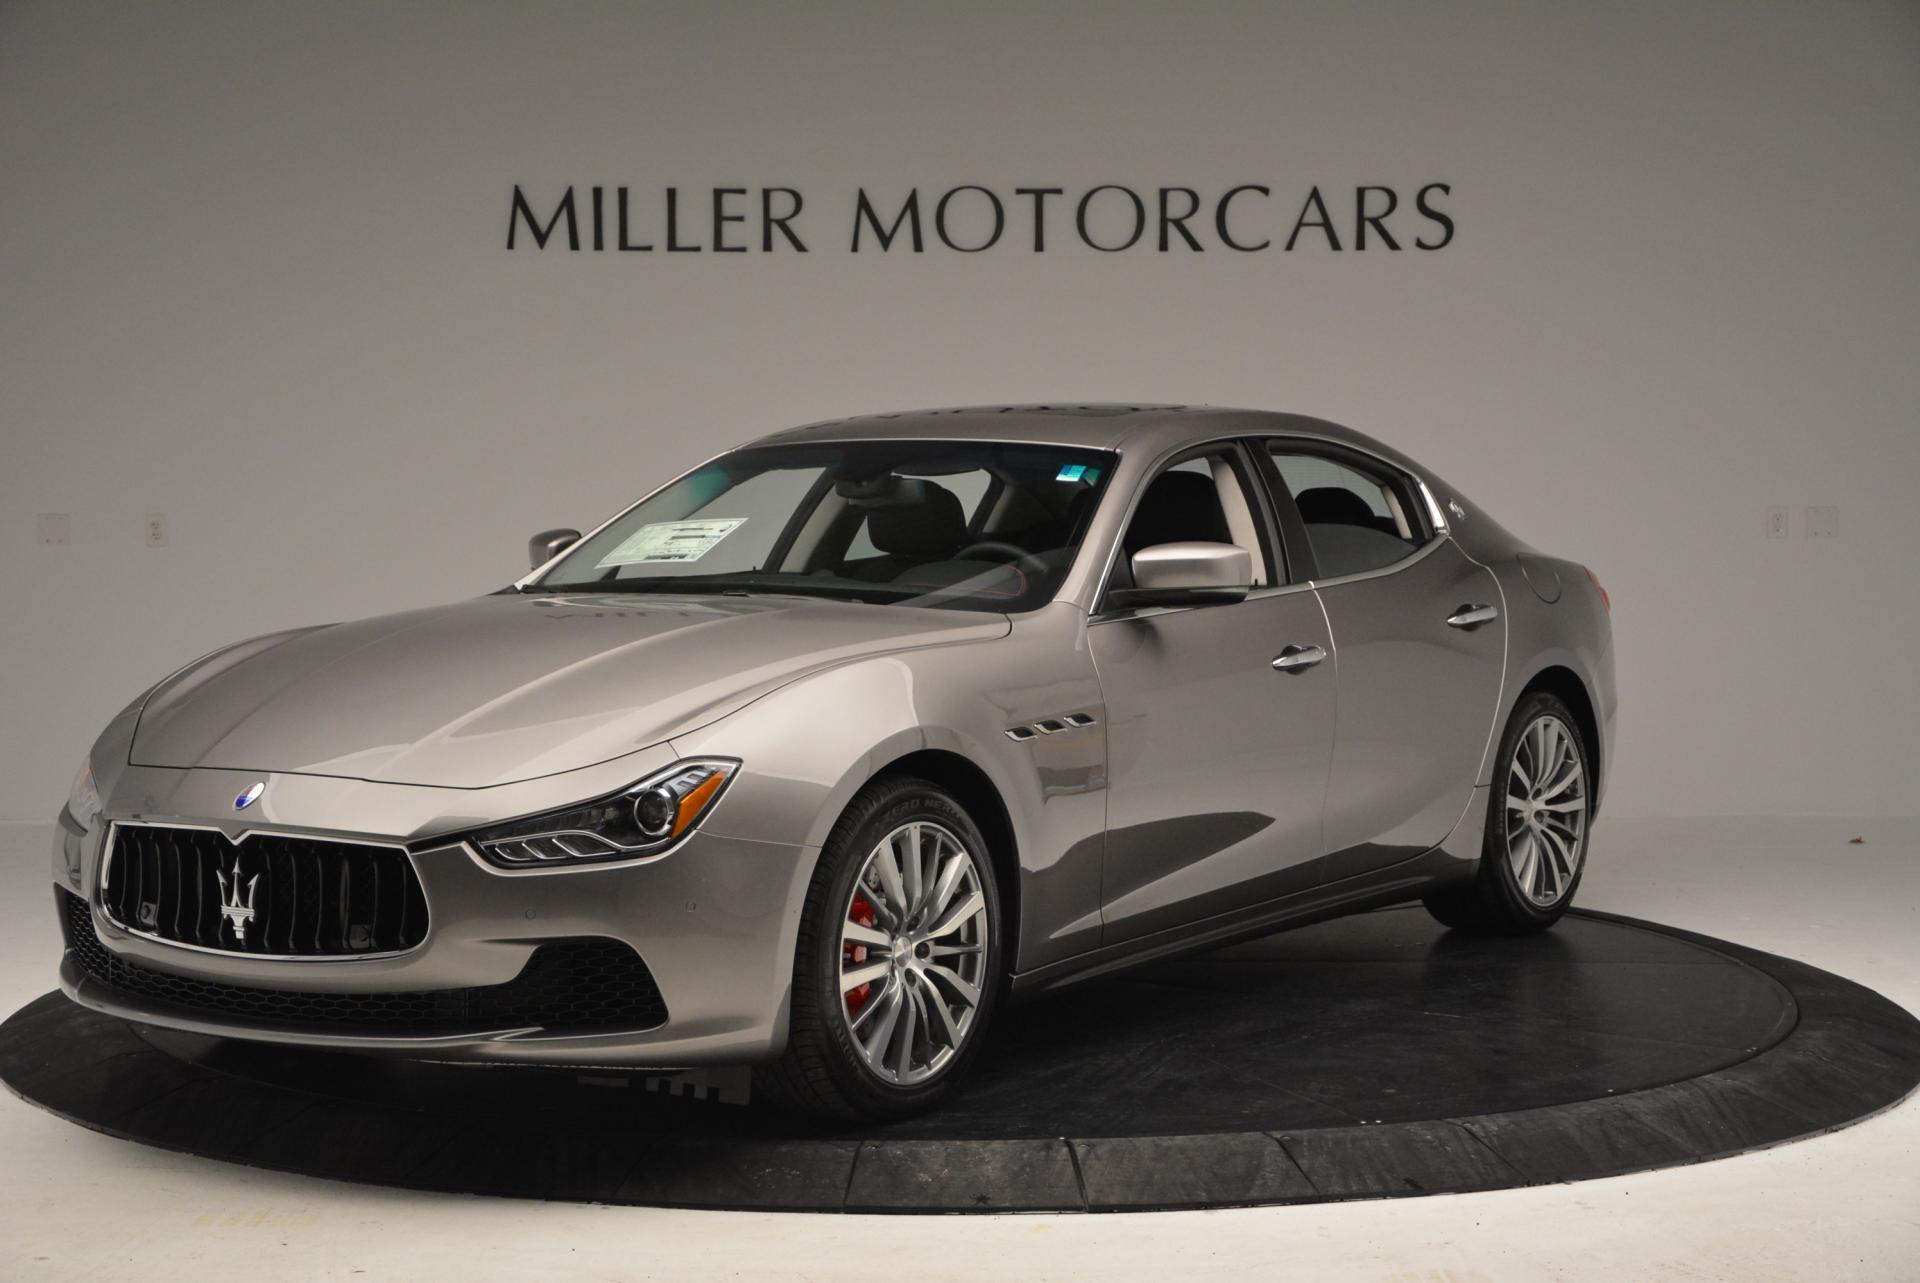 New 2016 Maserati Ghibli S Q4 for sale Sold at McLaren Greenwich in Greenwich CT 06830 1